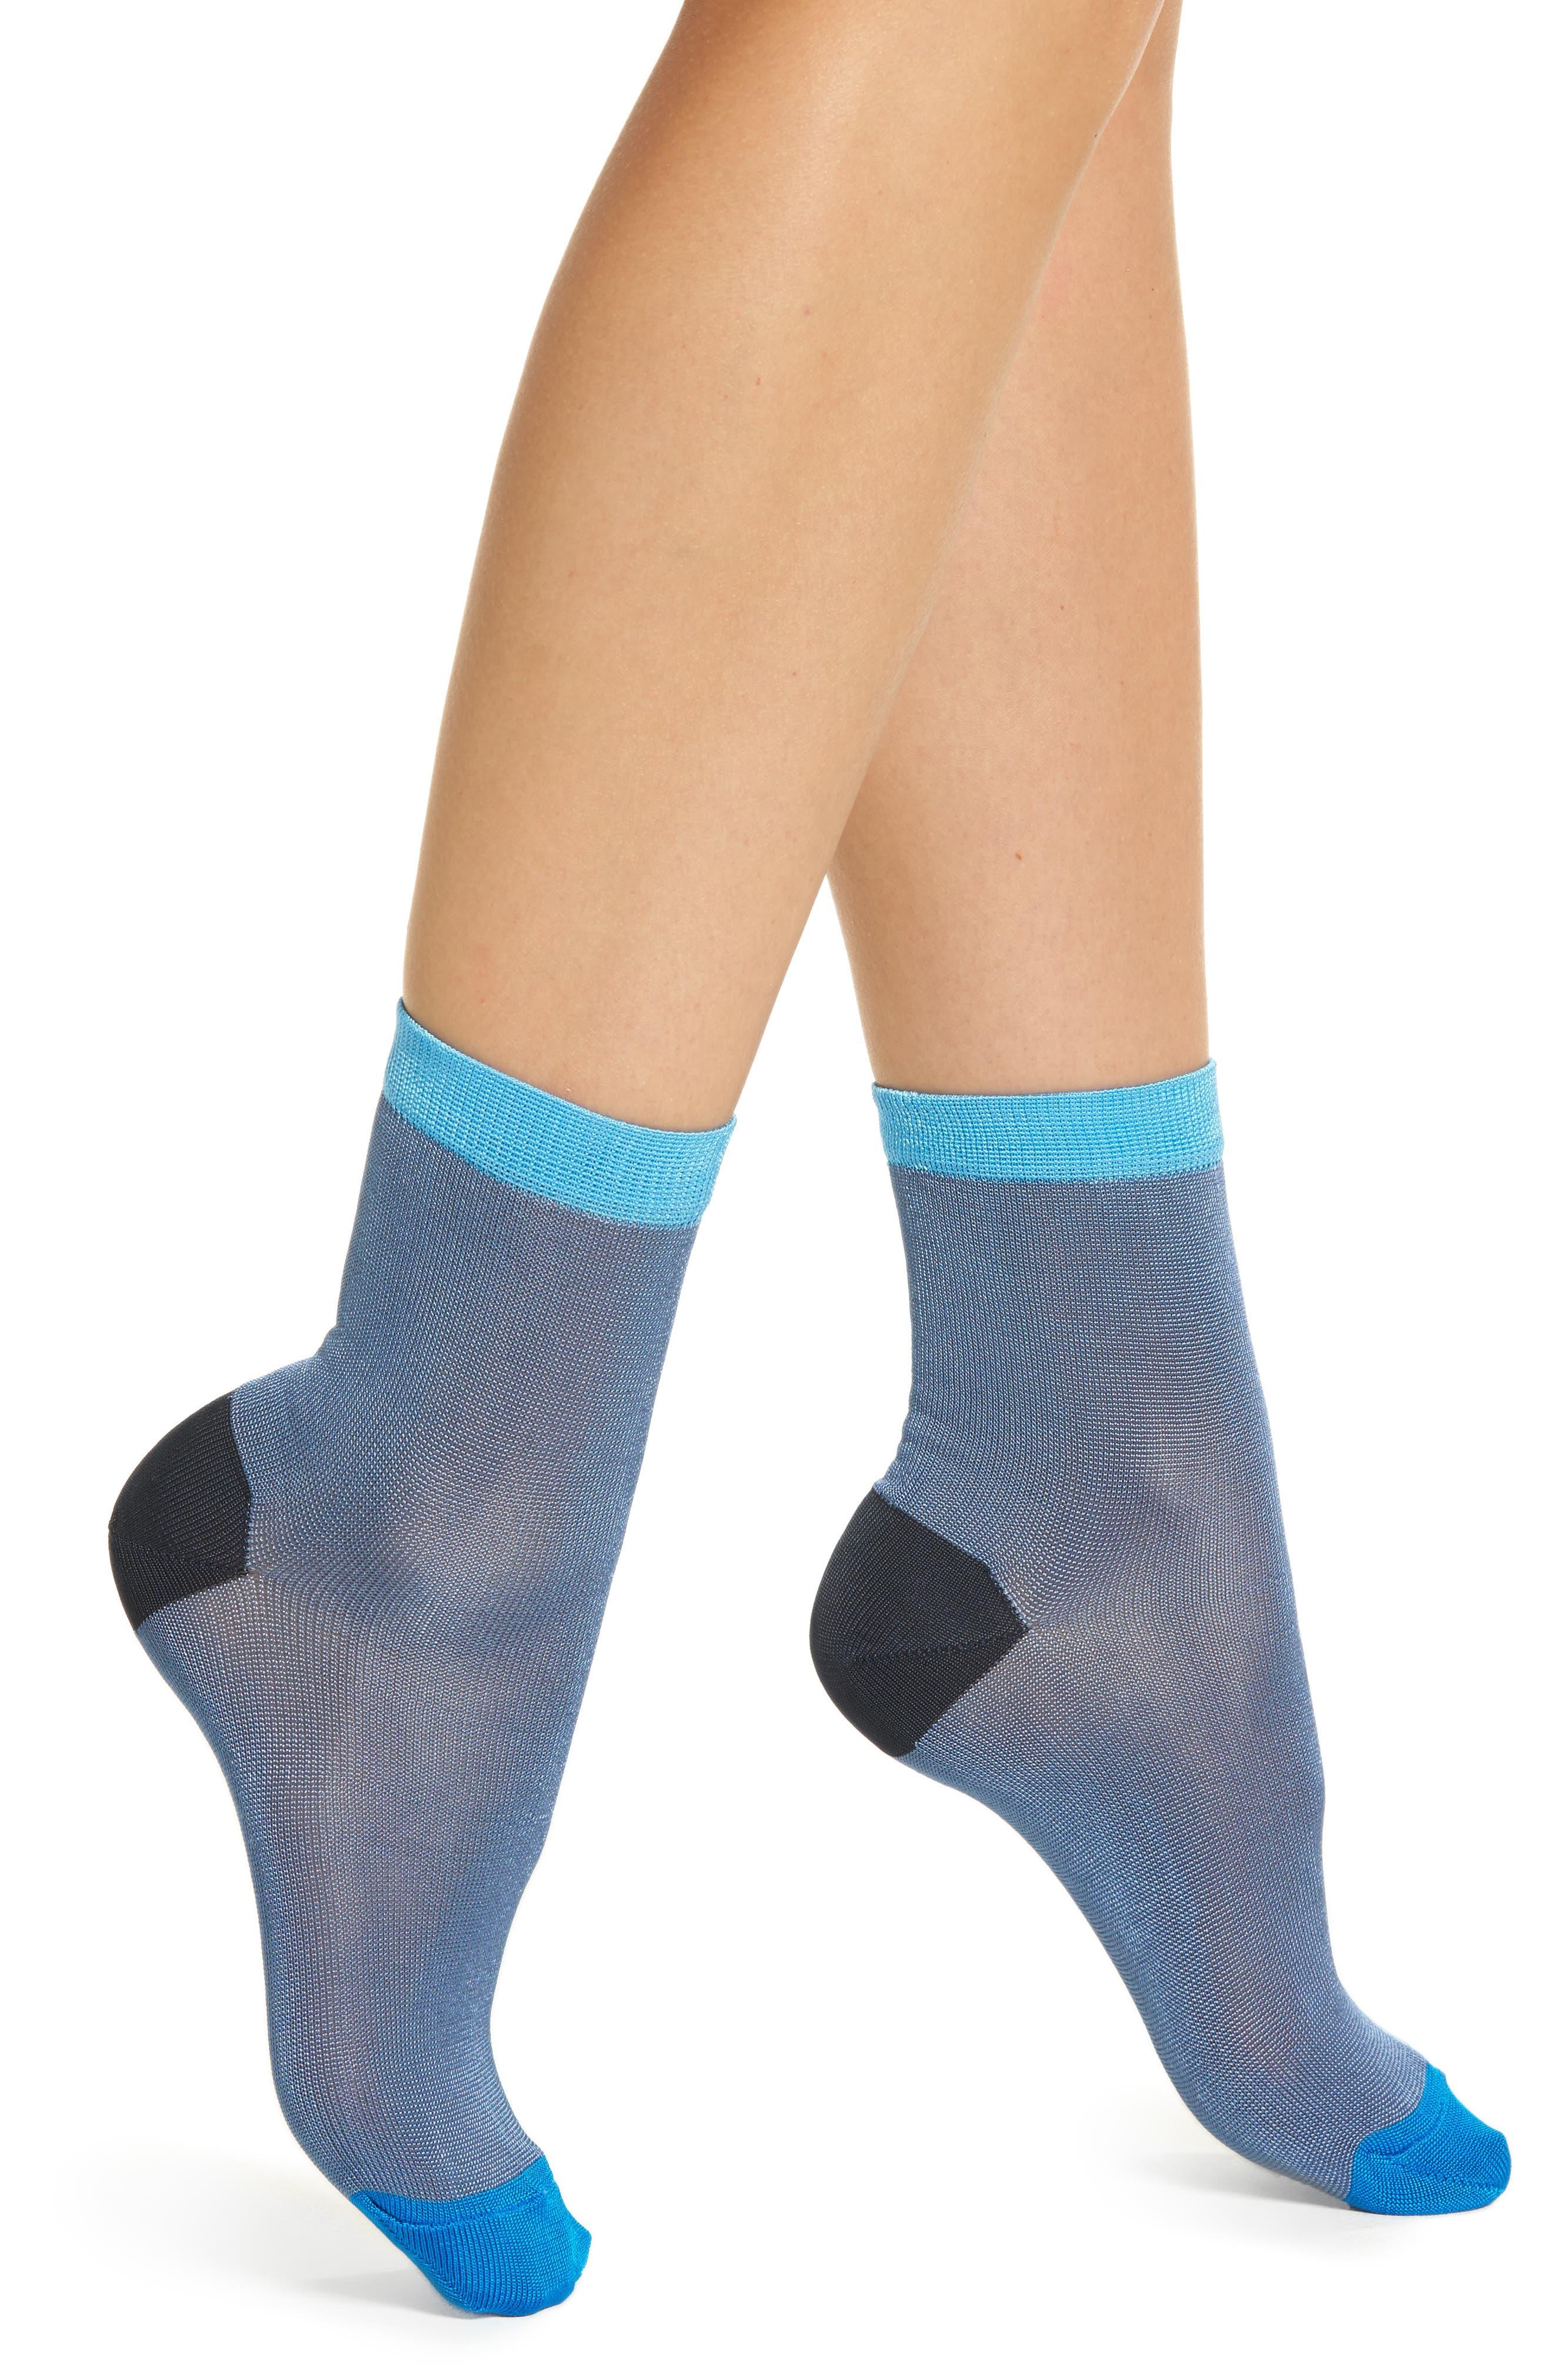 Grace Ankle Socks,                             Main thumbnail 1, color,                             BLUE